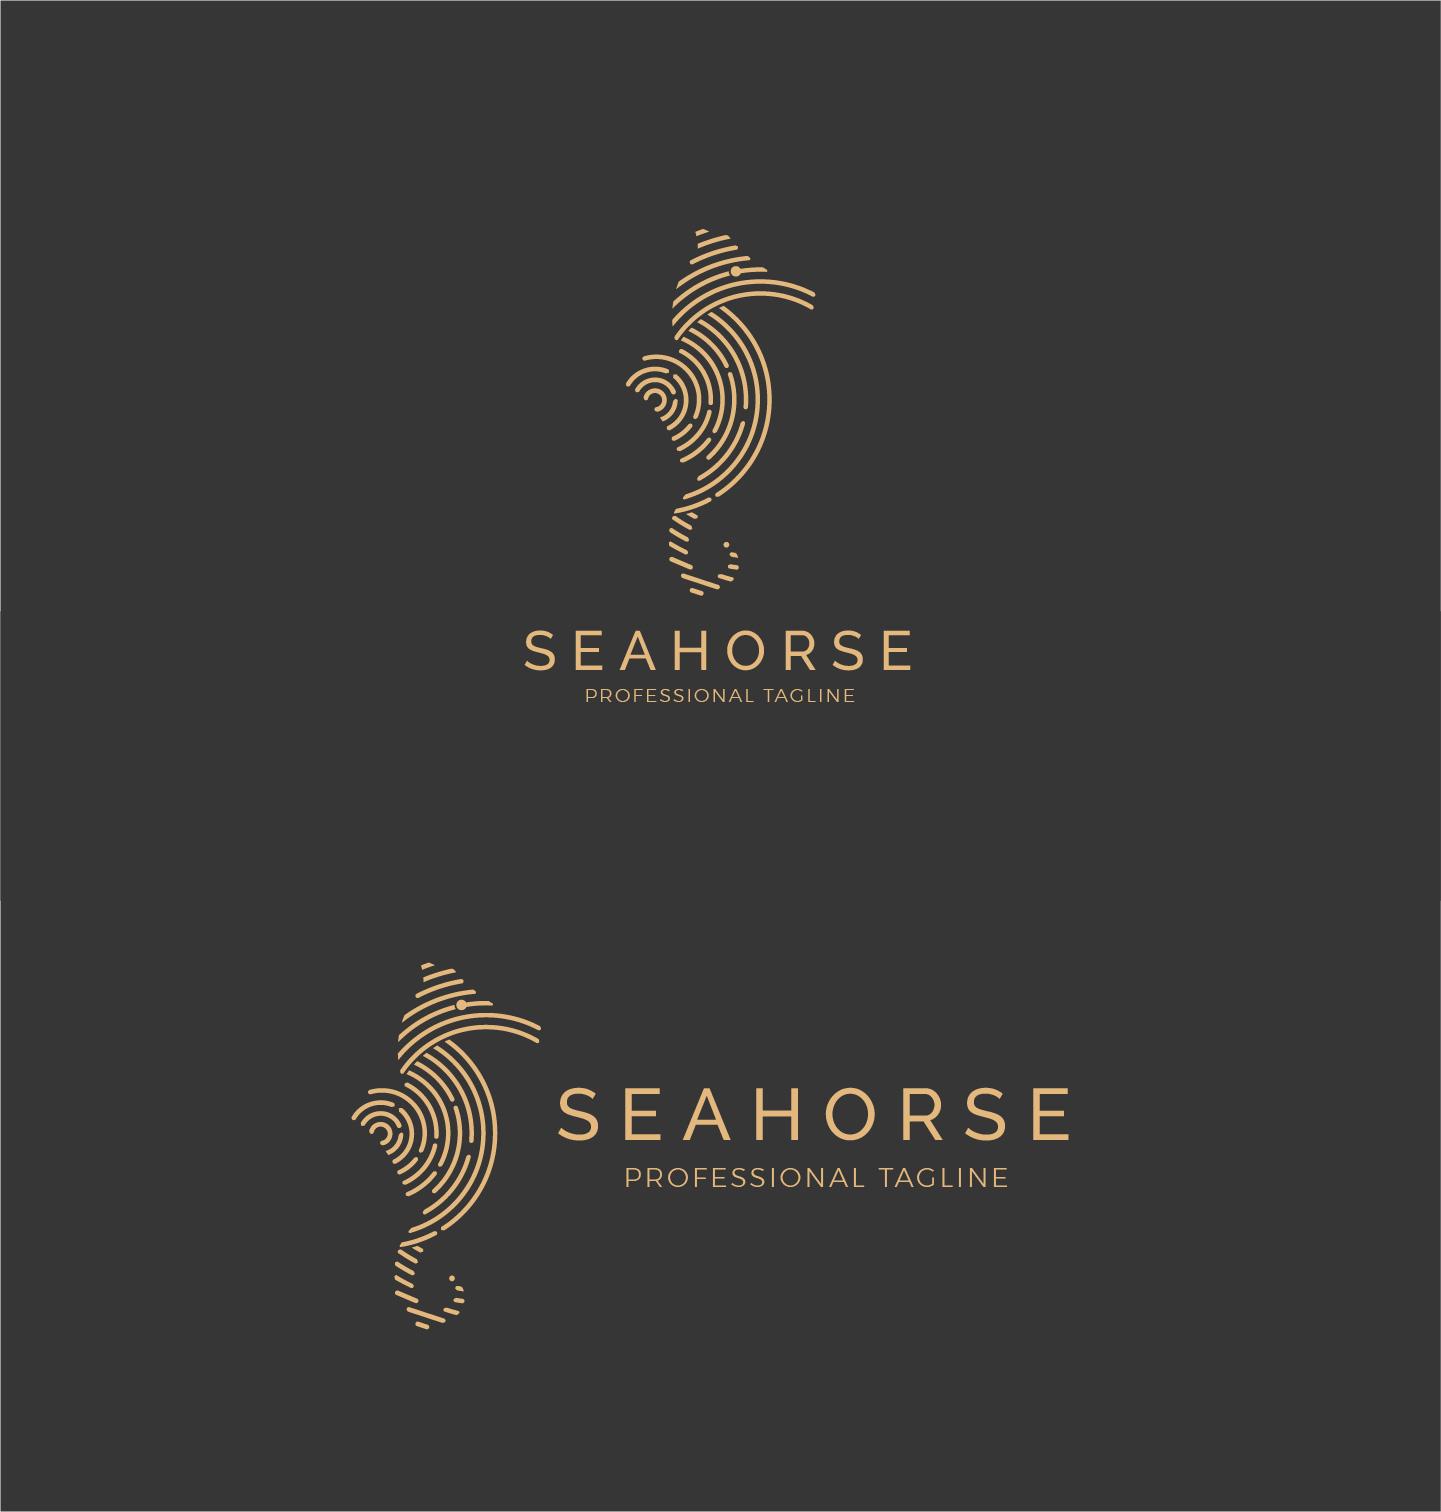 Animal Sea Logo - Seahorse Logo example image 2